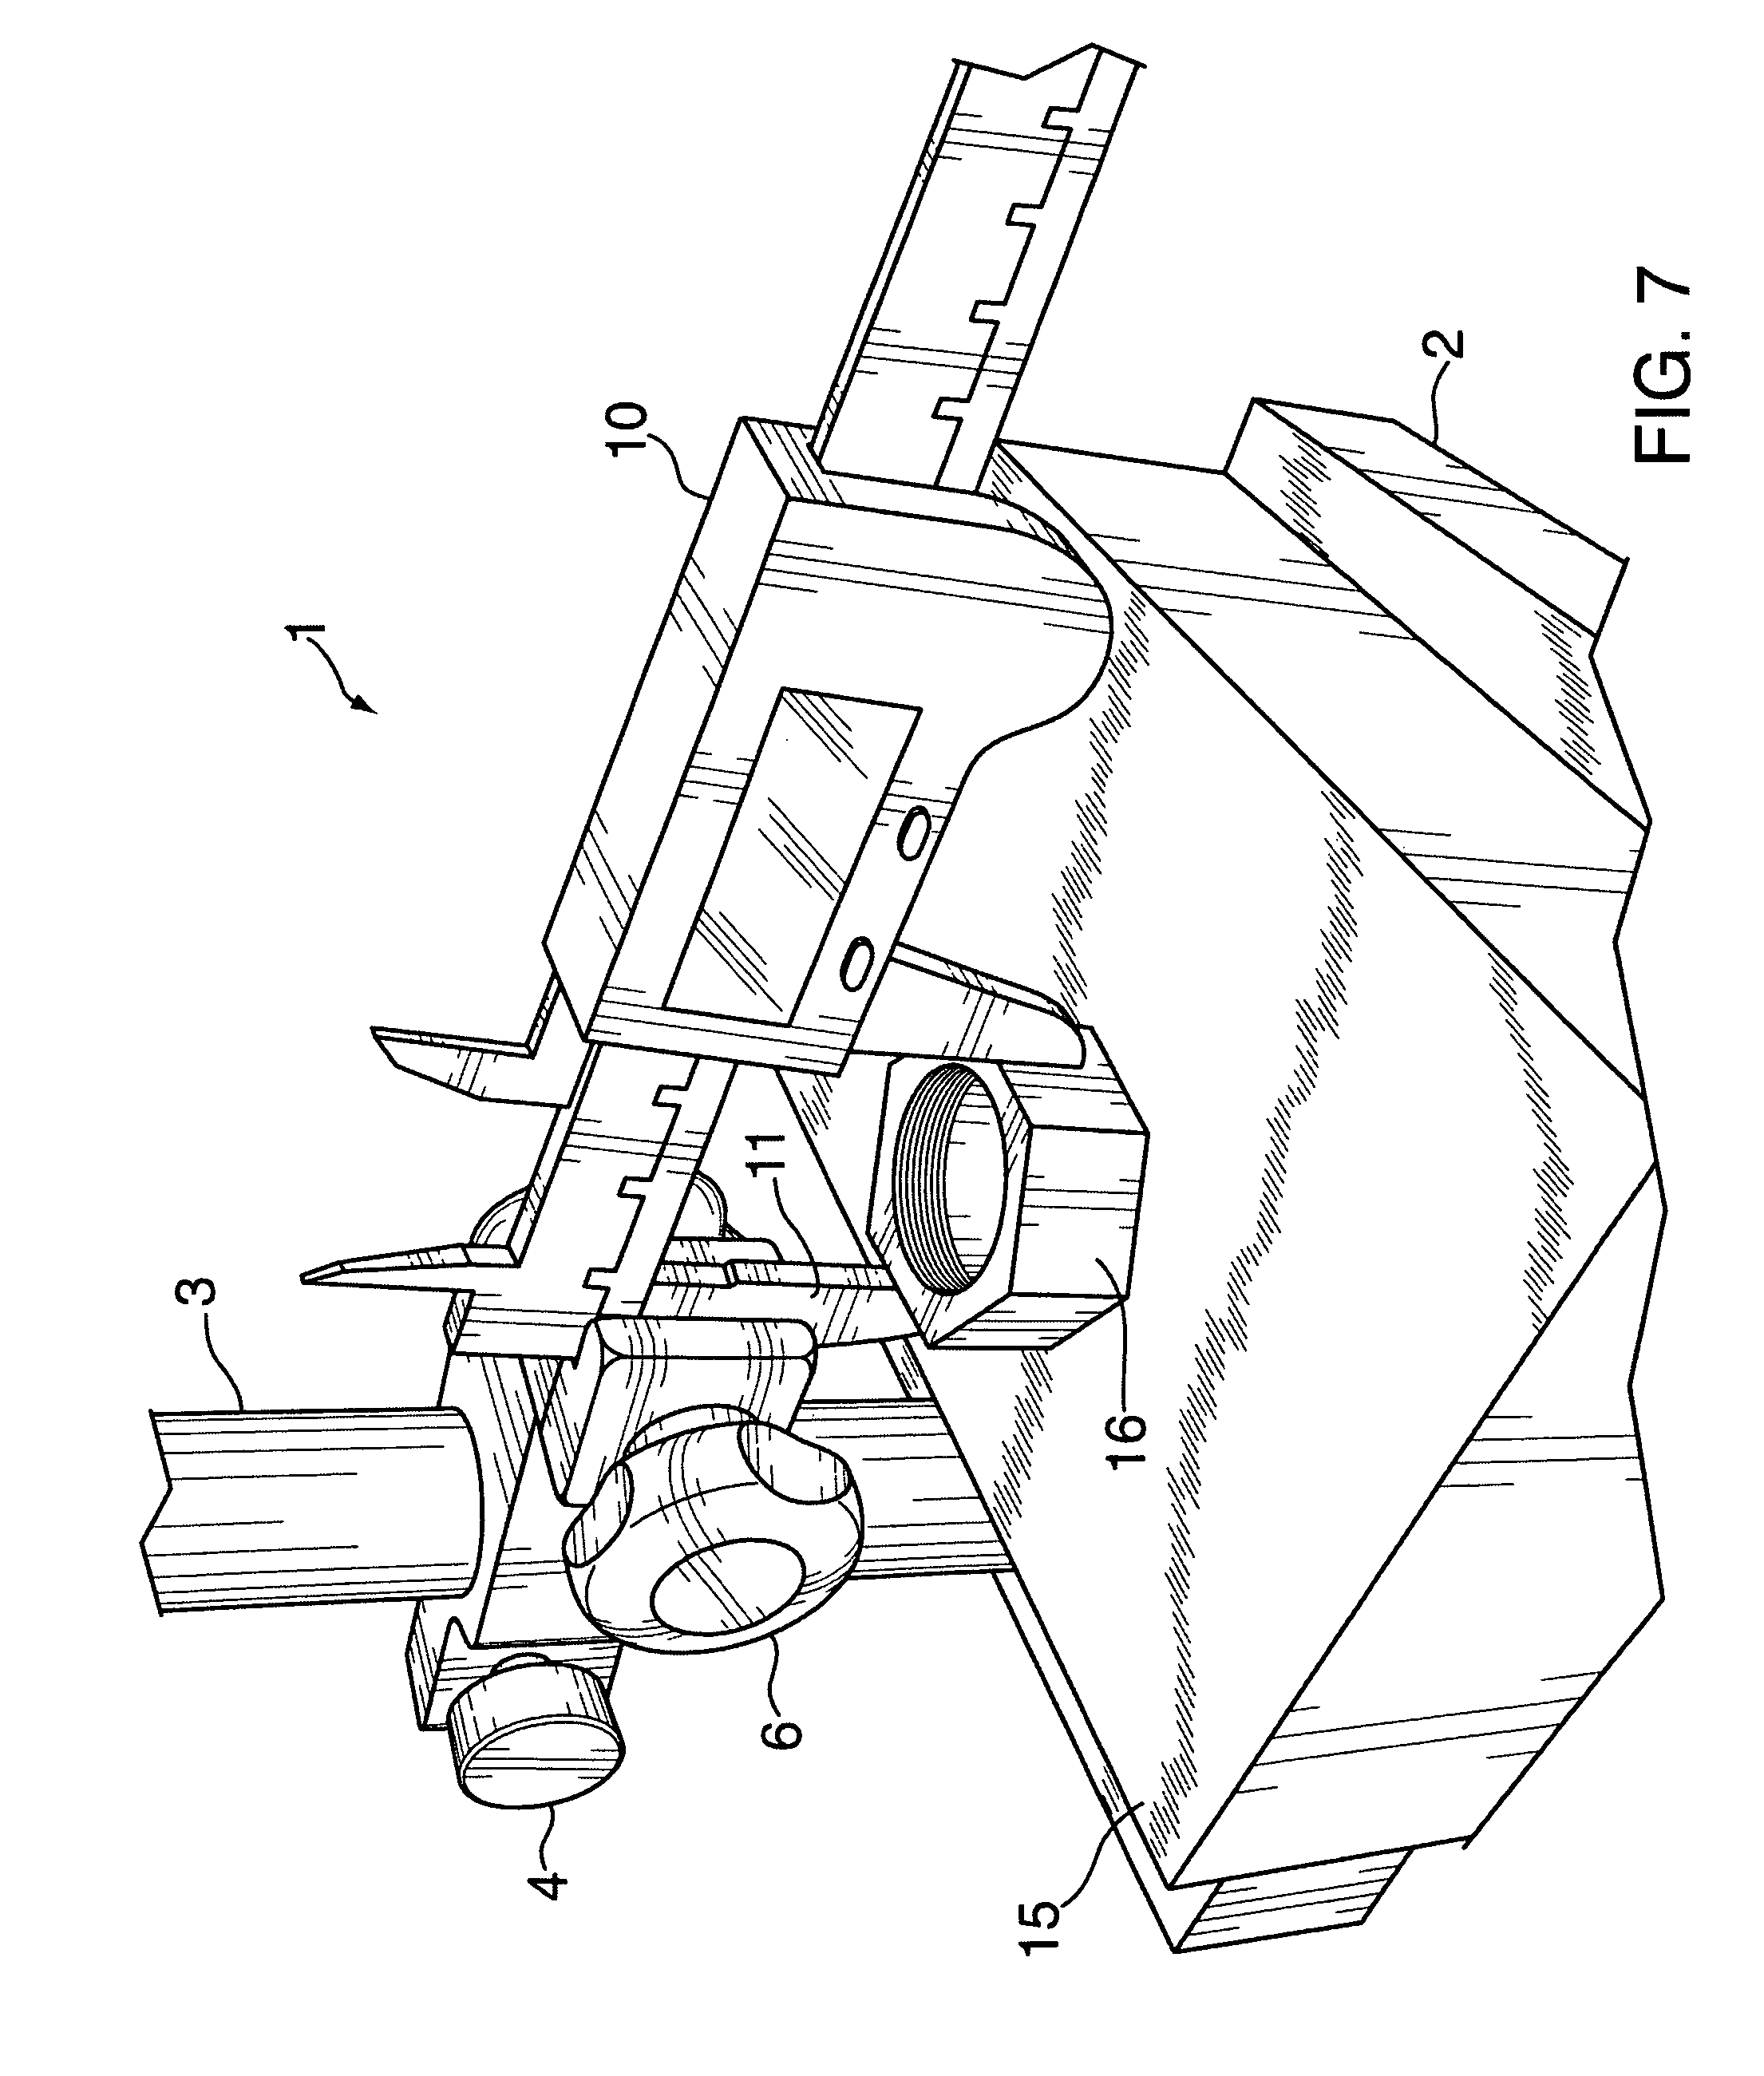 patent us8146263 - ergonomic vernier caliper base